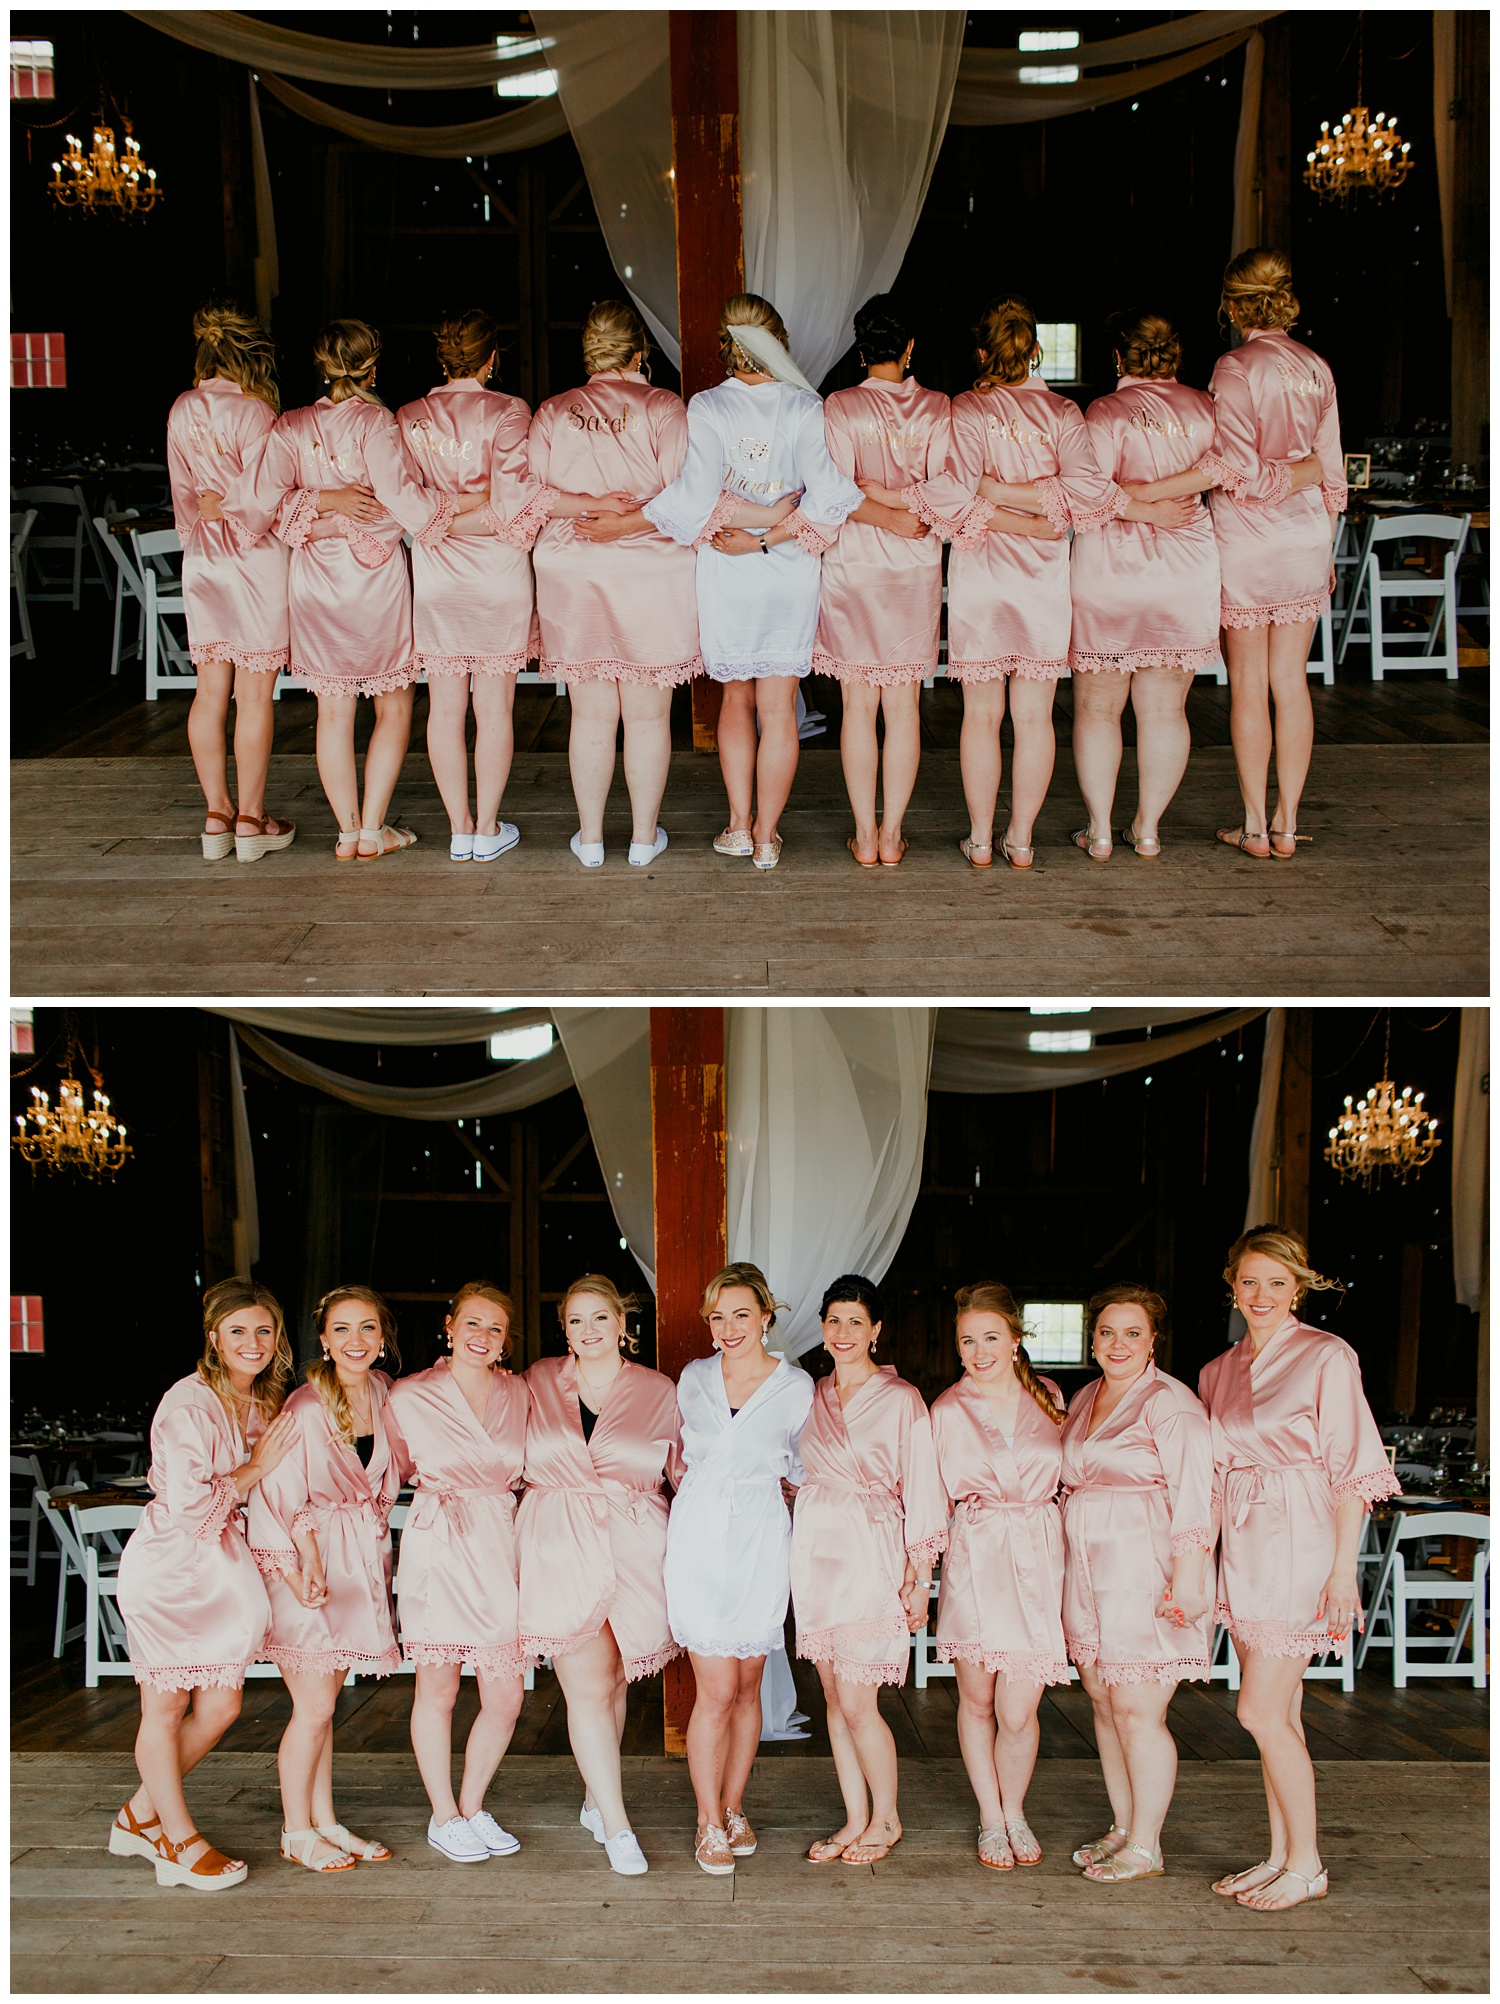 blissfulbarn threeoaks michigan wedding photography journeymandistillery26.jpg